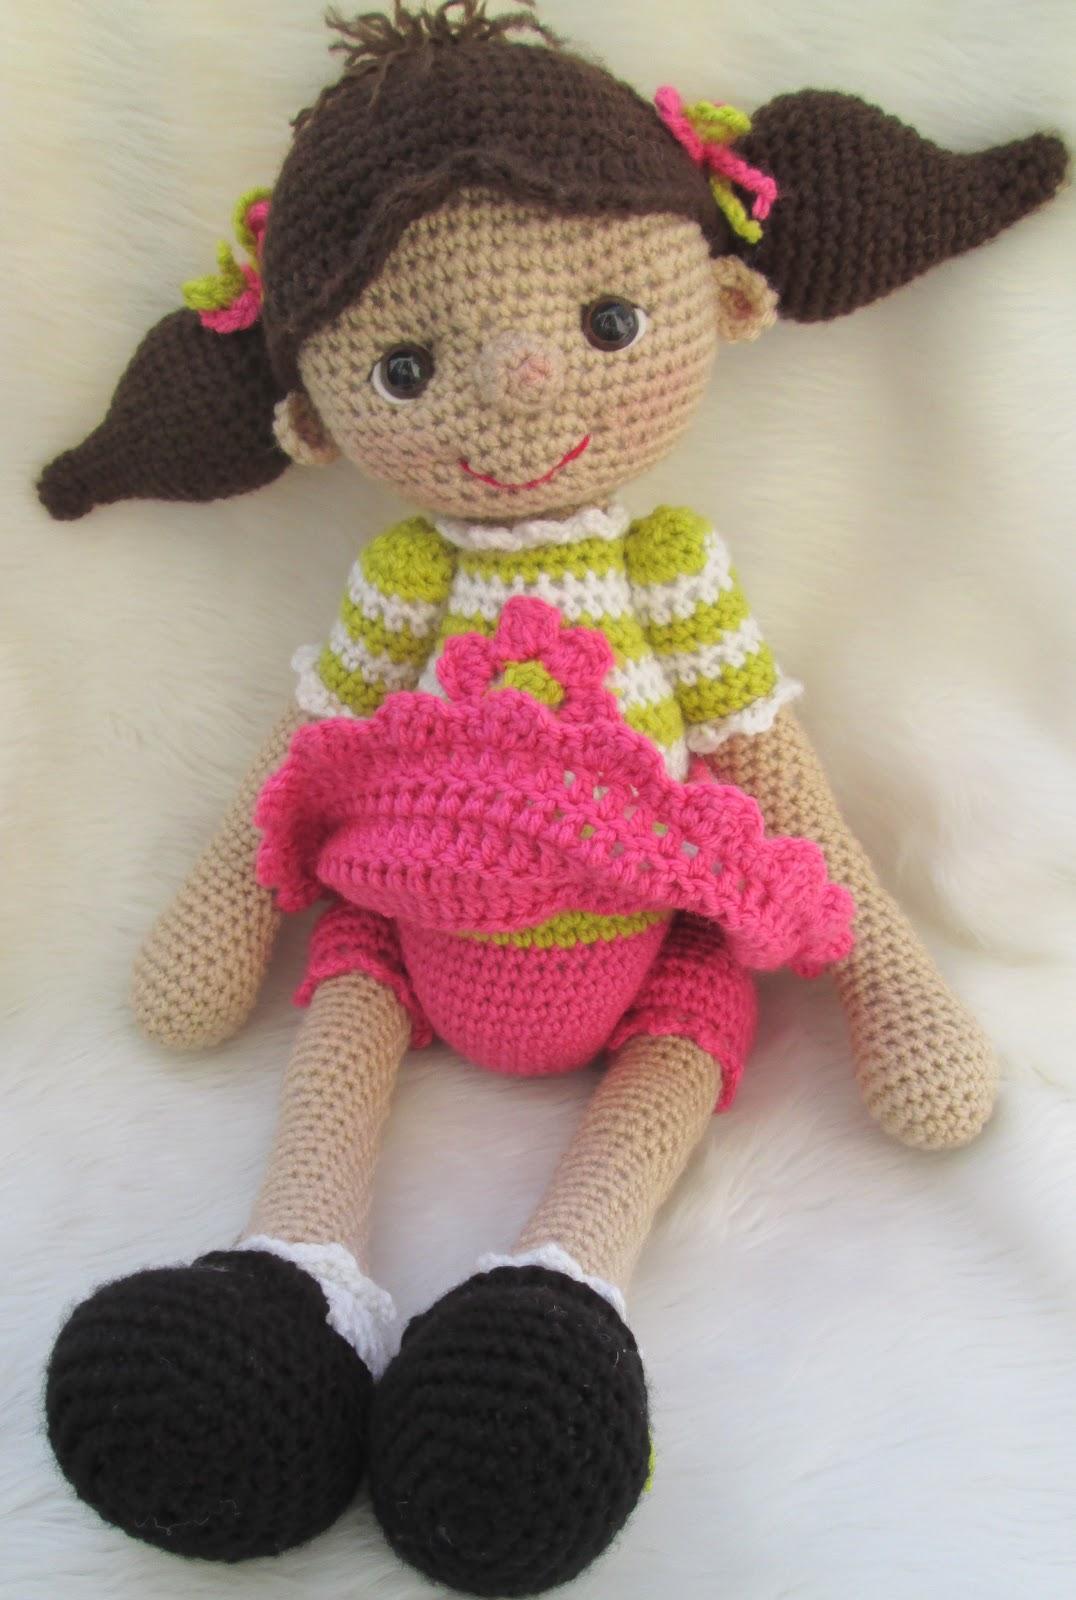 Teri's Blog: So Cute Dolly, A New Huggable Dolly Pattern